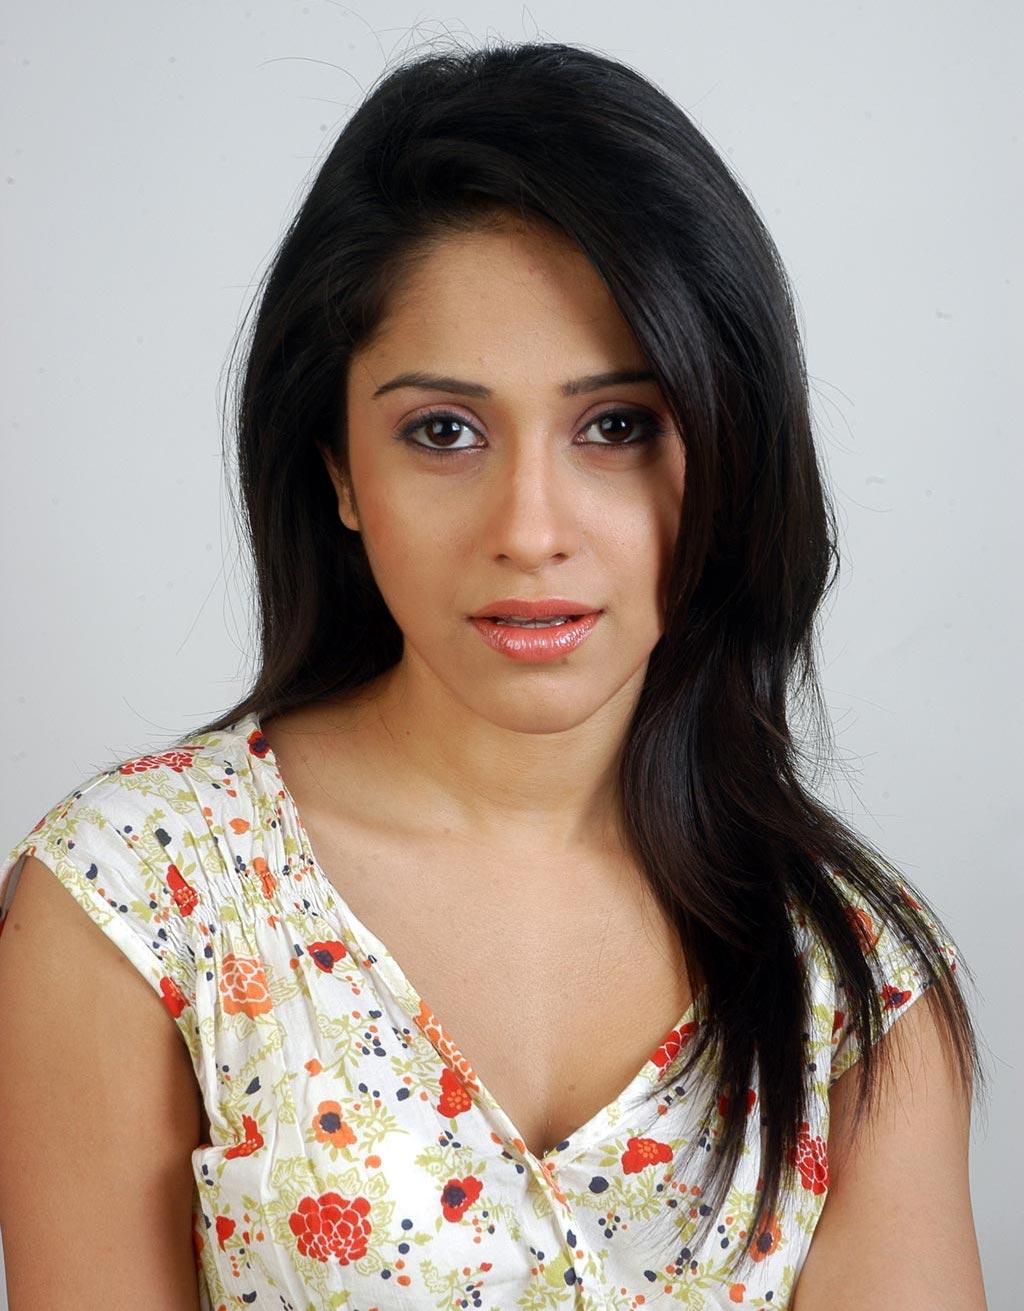 51 Top Hd Wallpaper Sauth Indian Actress Hd Wallpaper-2010